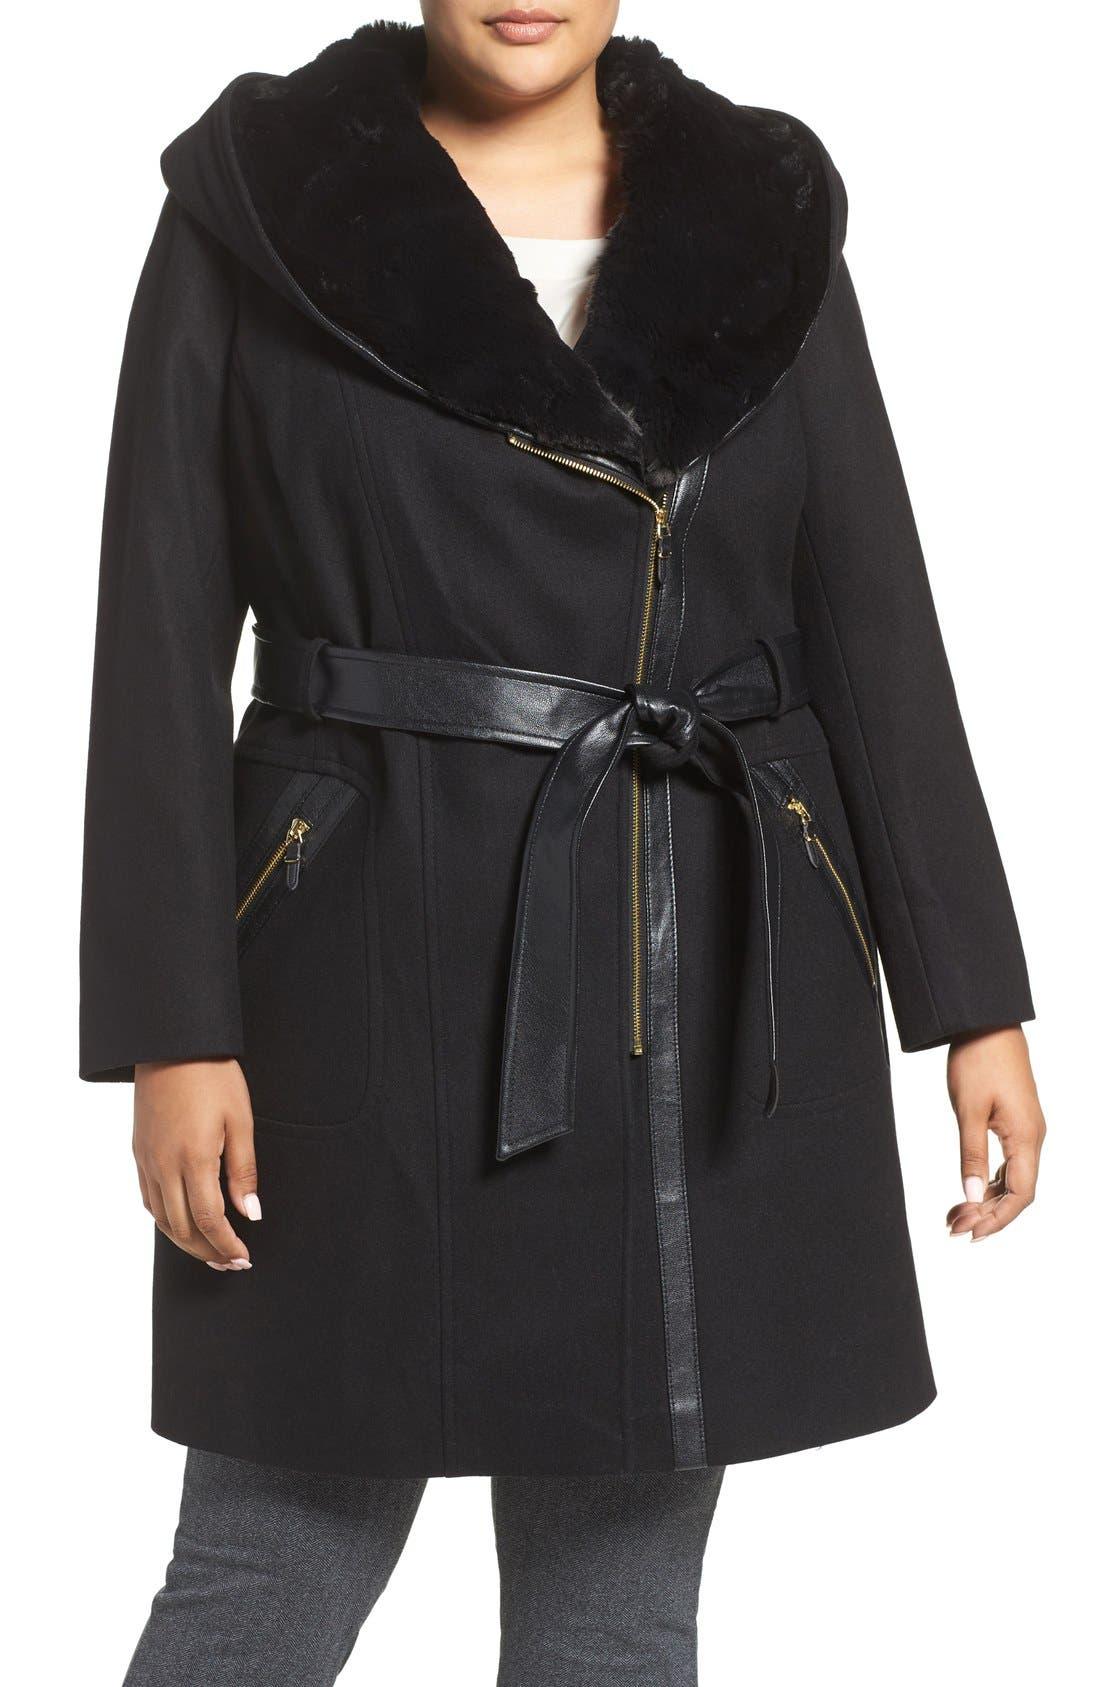 VIA SPIGA Wool Blend Coat with Faux Fur Trim, Main, color, 001